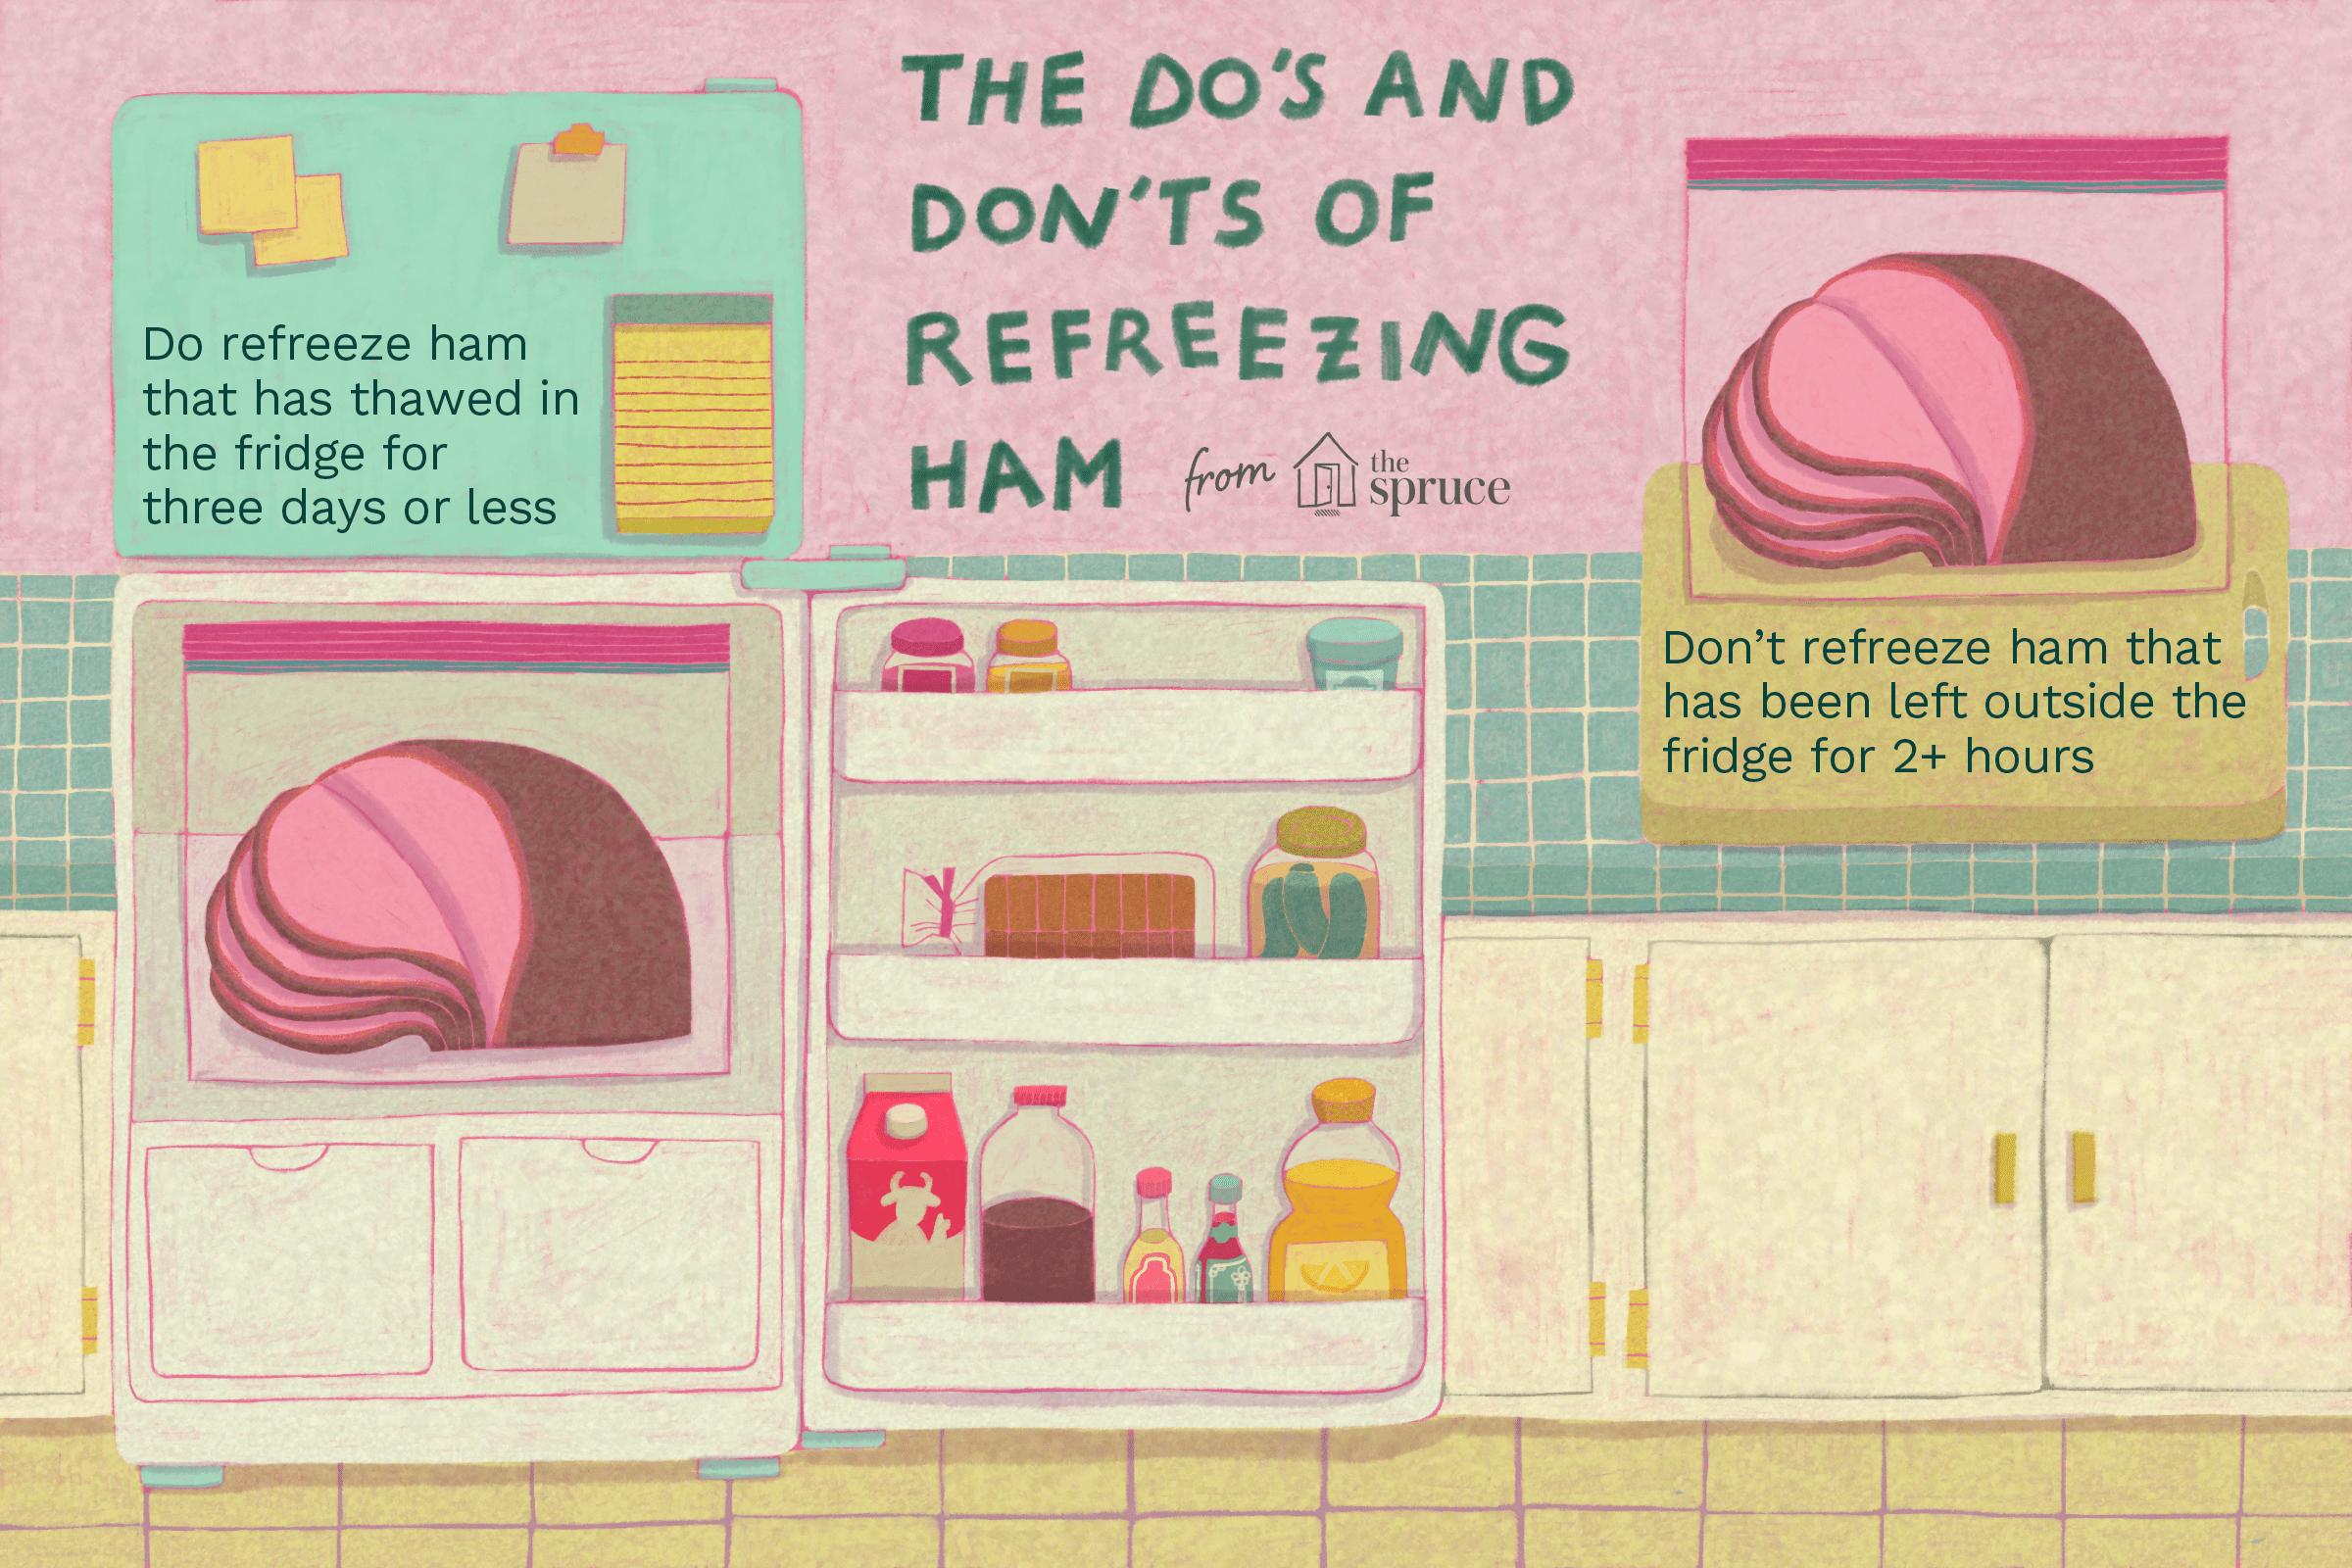 refreeze ham